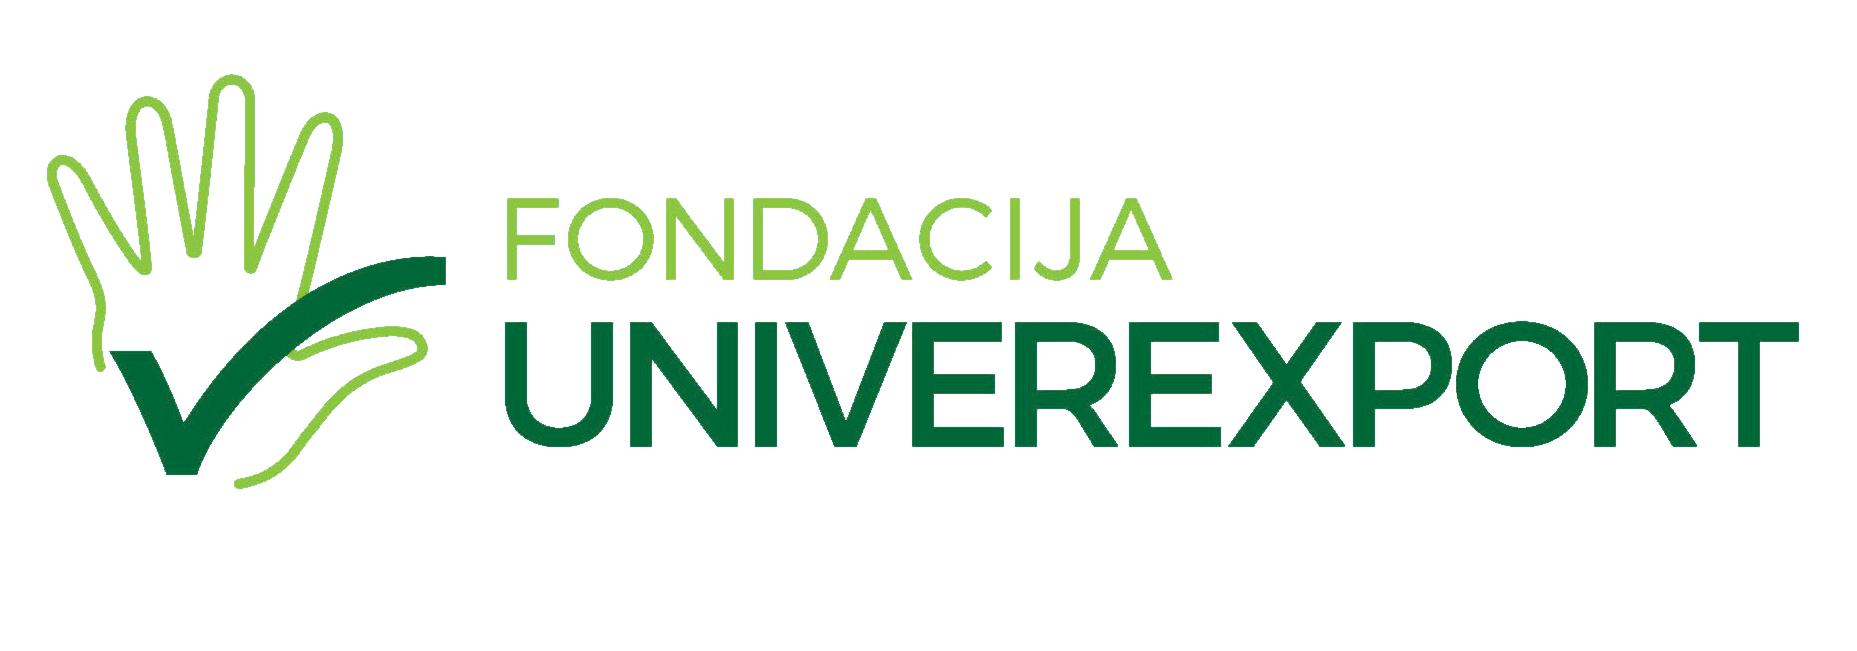 Fondacija Univerexport